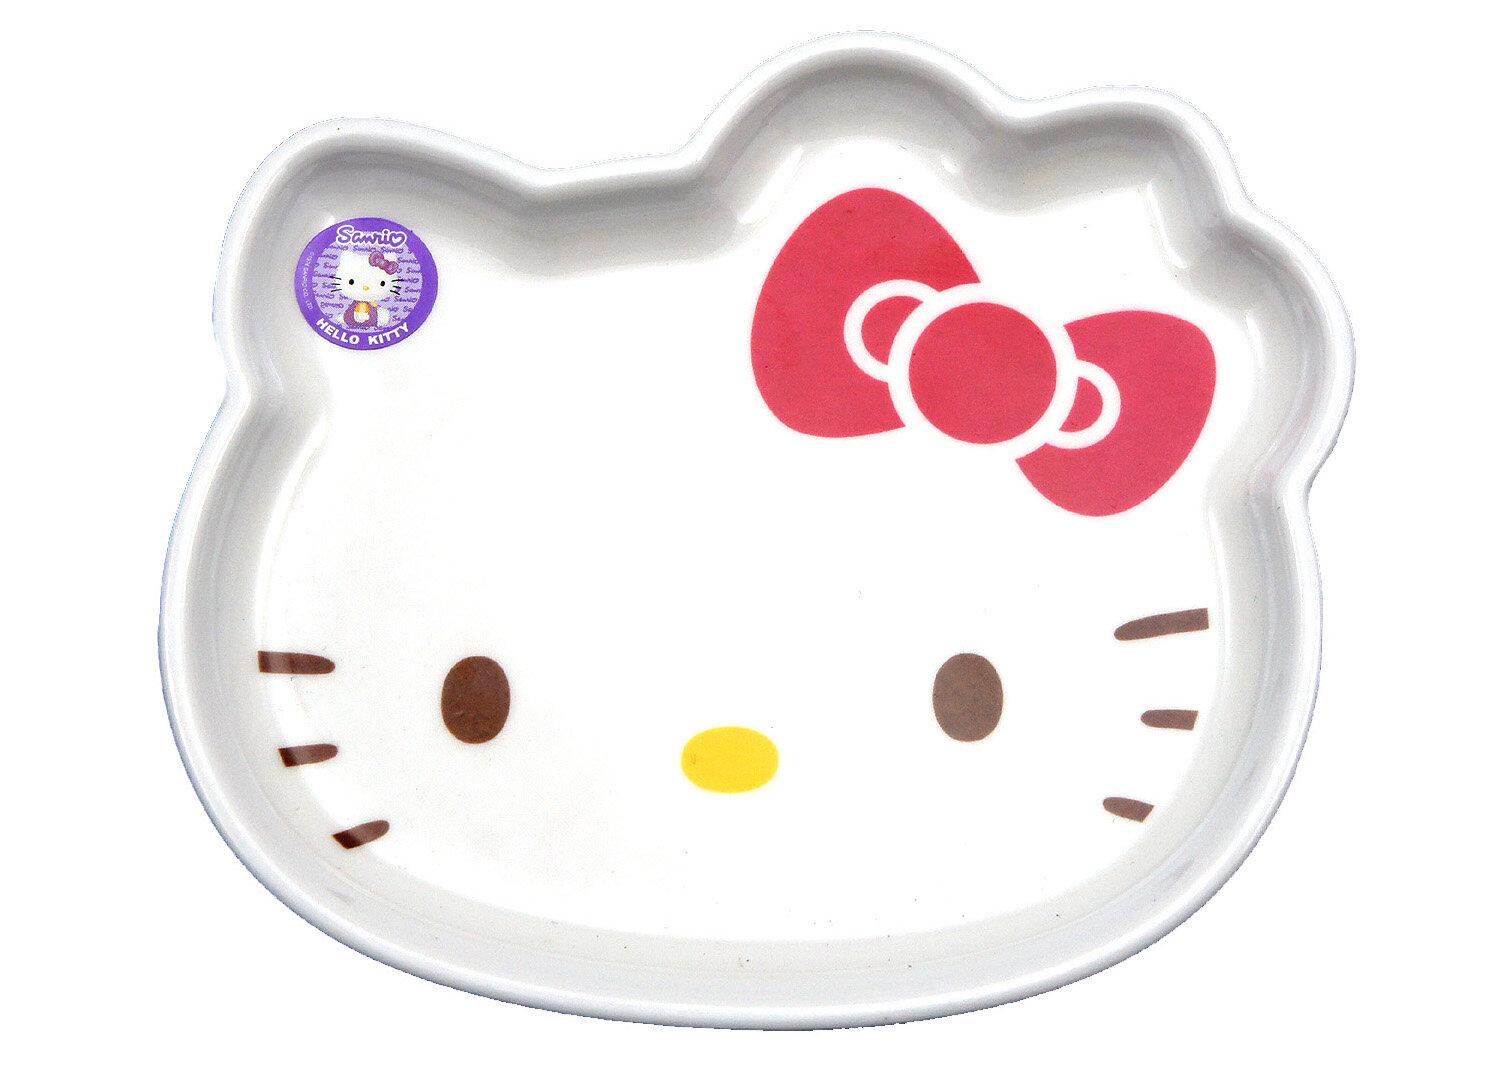 Đĩa Superware họa tiết Hello Kitty P6083